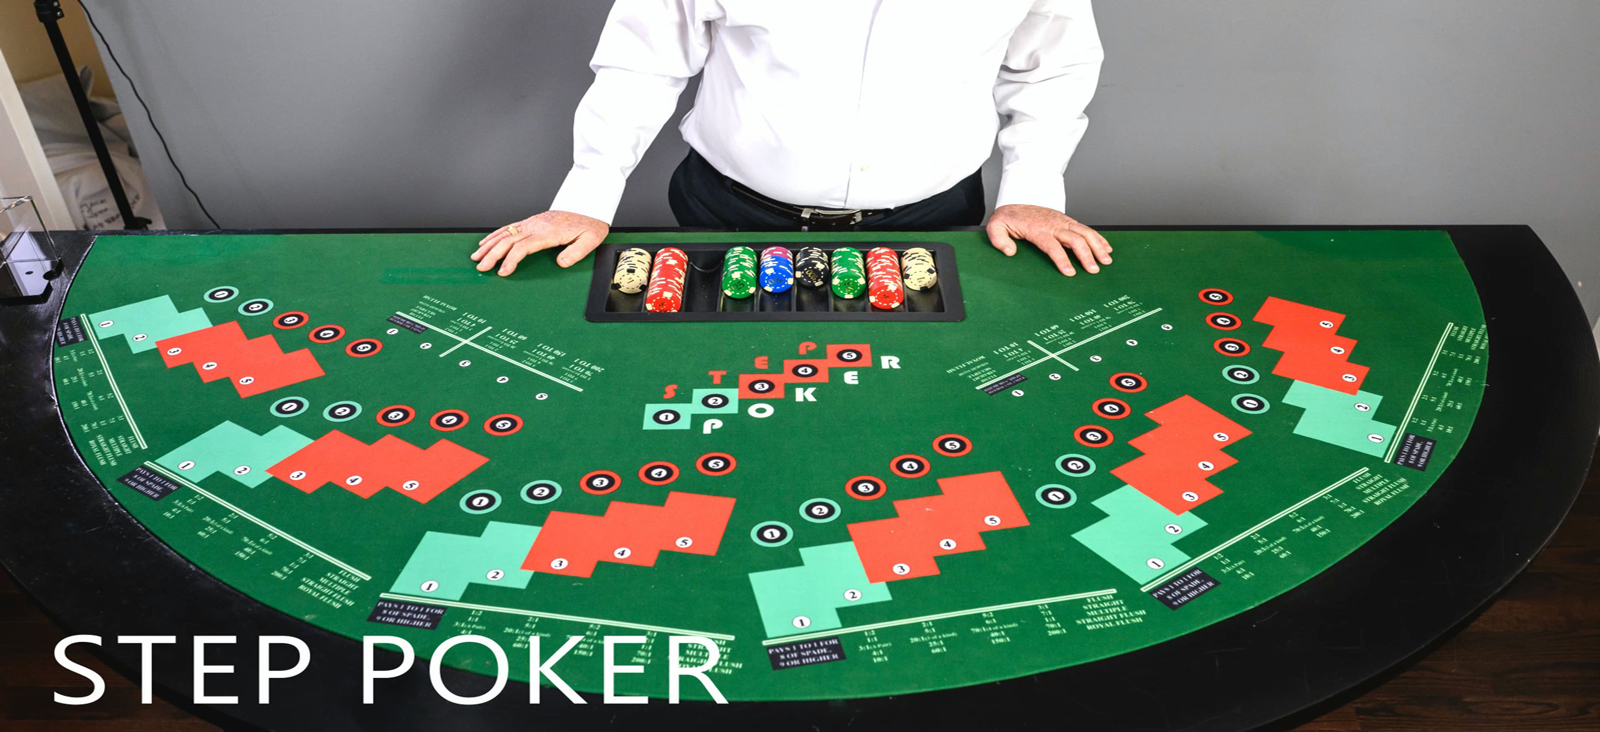 Step Poker